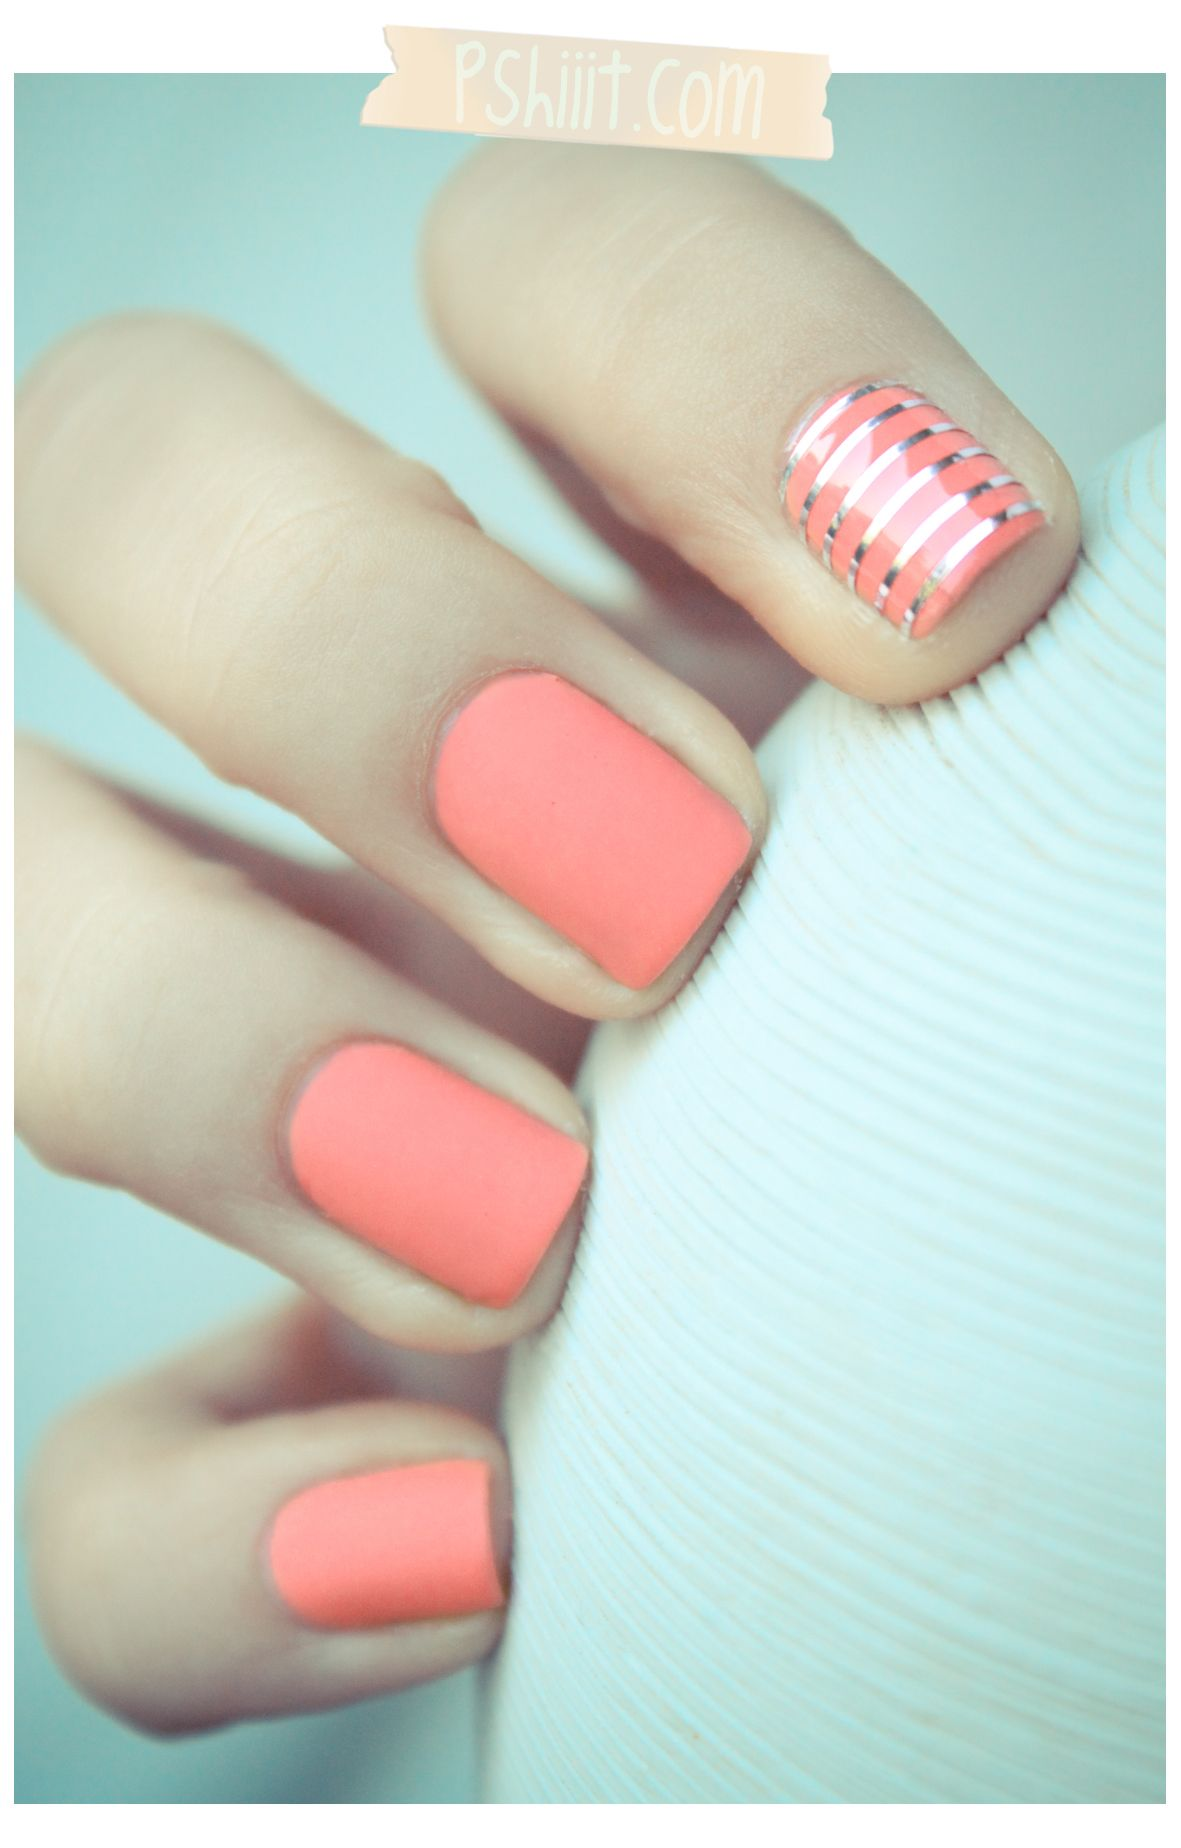 Essie – Tart Deco   Metallic, Pastels and Matte nails